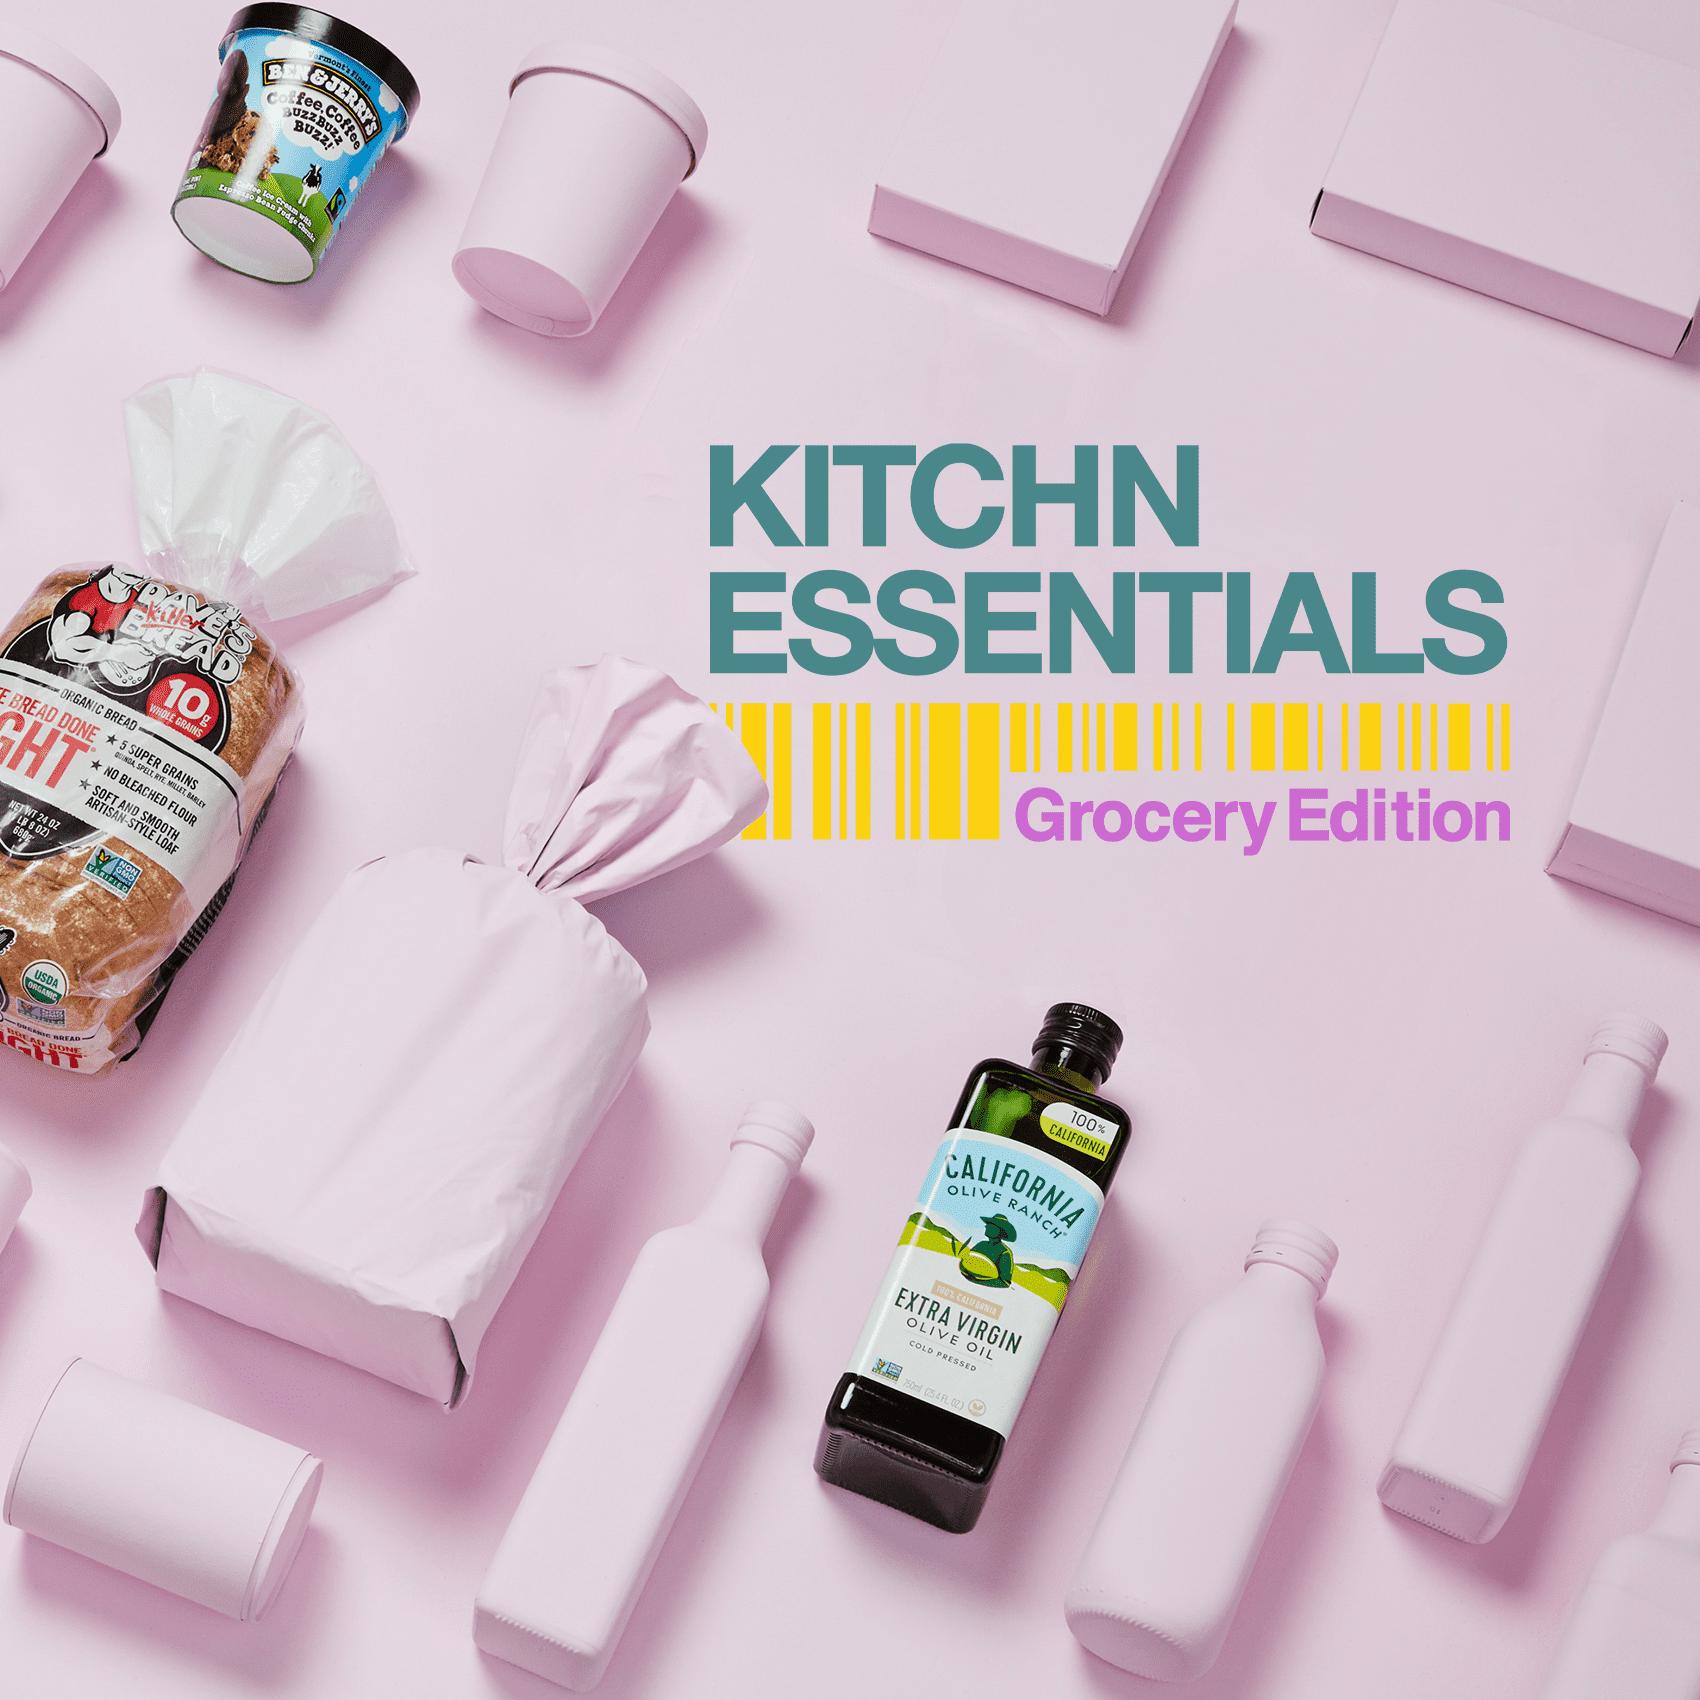 Kitchn Essentials: Grocery Edition